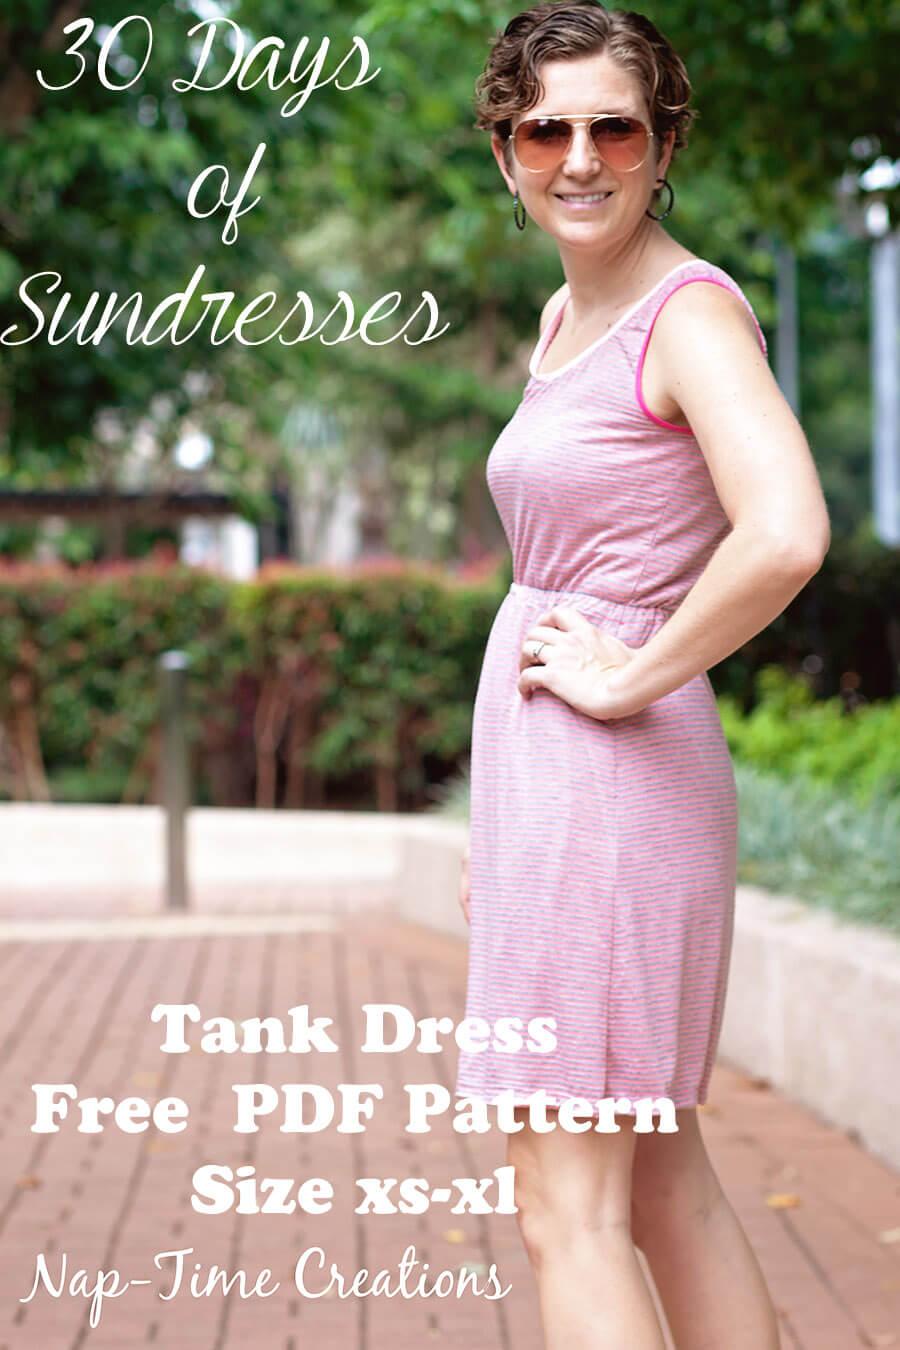 Womens tank dress free pattern life sew savory womens tank dress free pattern size xs xl made with knit fabric ombrellifo Images